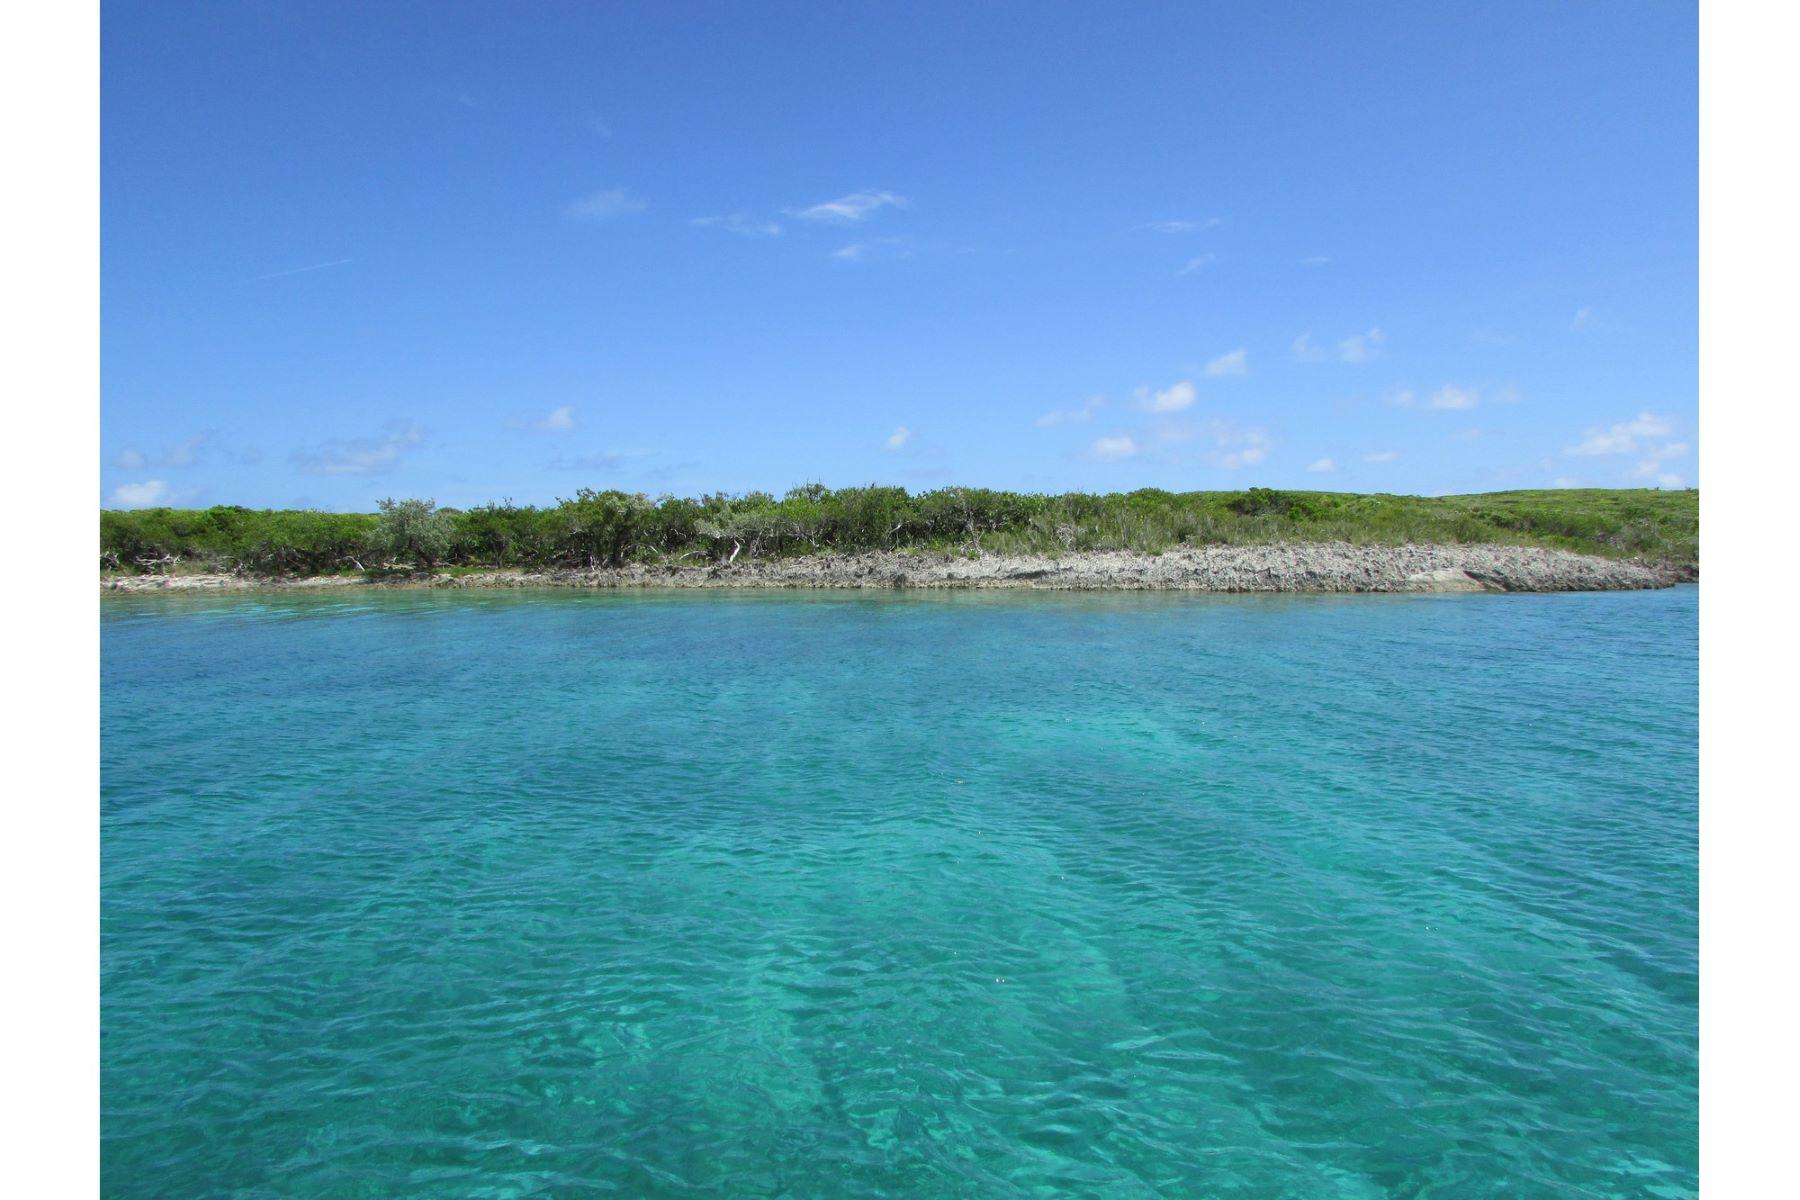 Terreno para Venda às Lot 8 Bluffs of Tilloo Tilloo Cay, Abaco, Bahamas